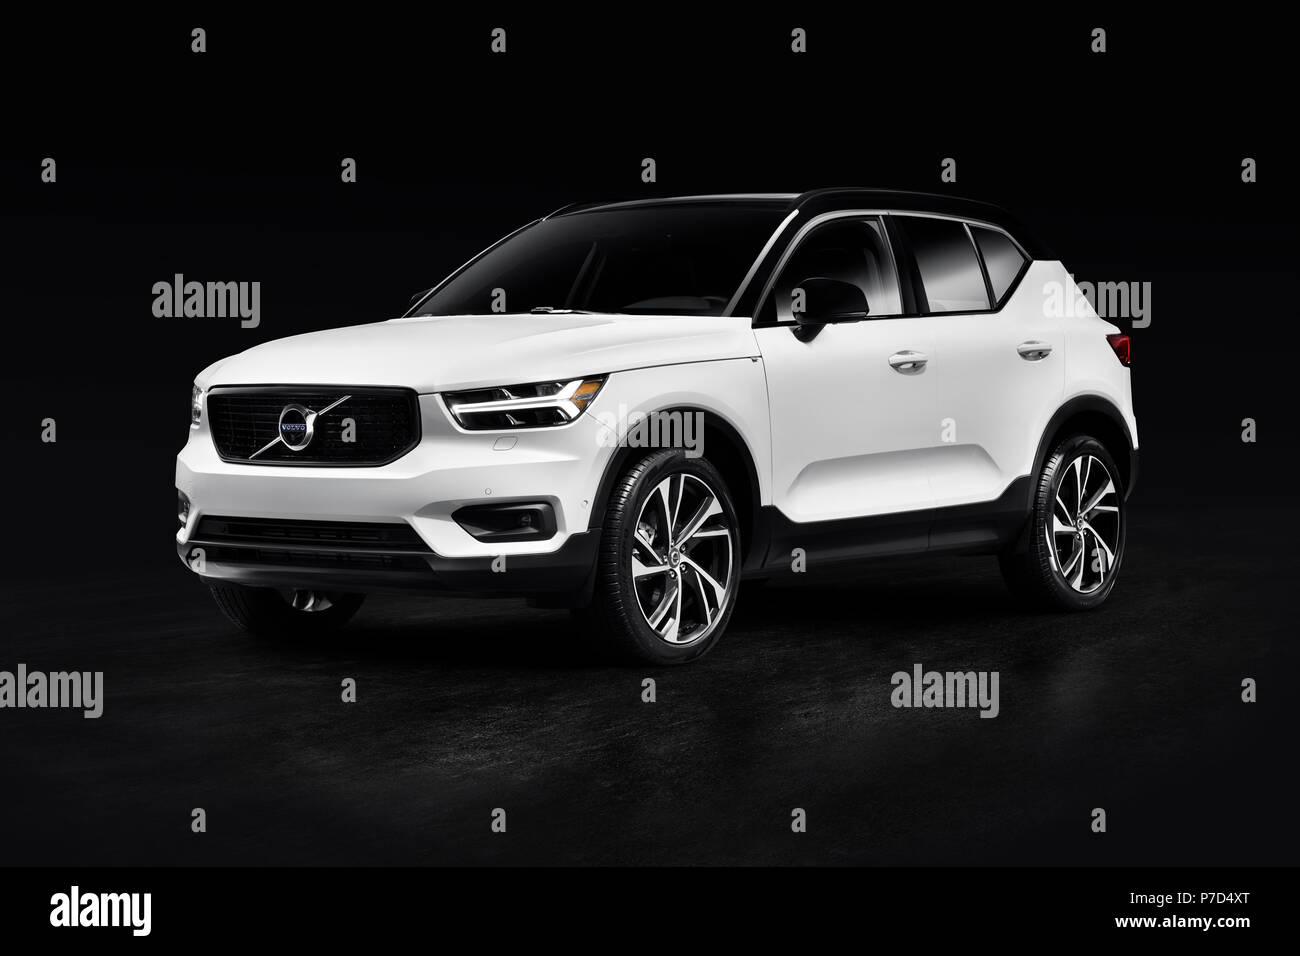 White 2019 Volvo Xc40 T5 Awd R Design Suv Voitures De Luxe Isole Sur